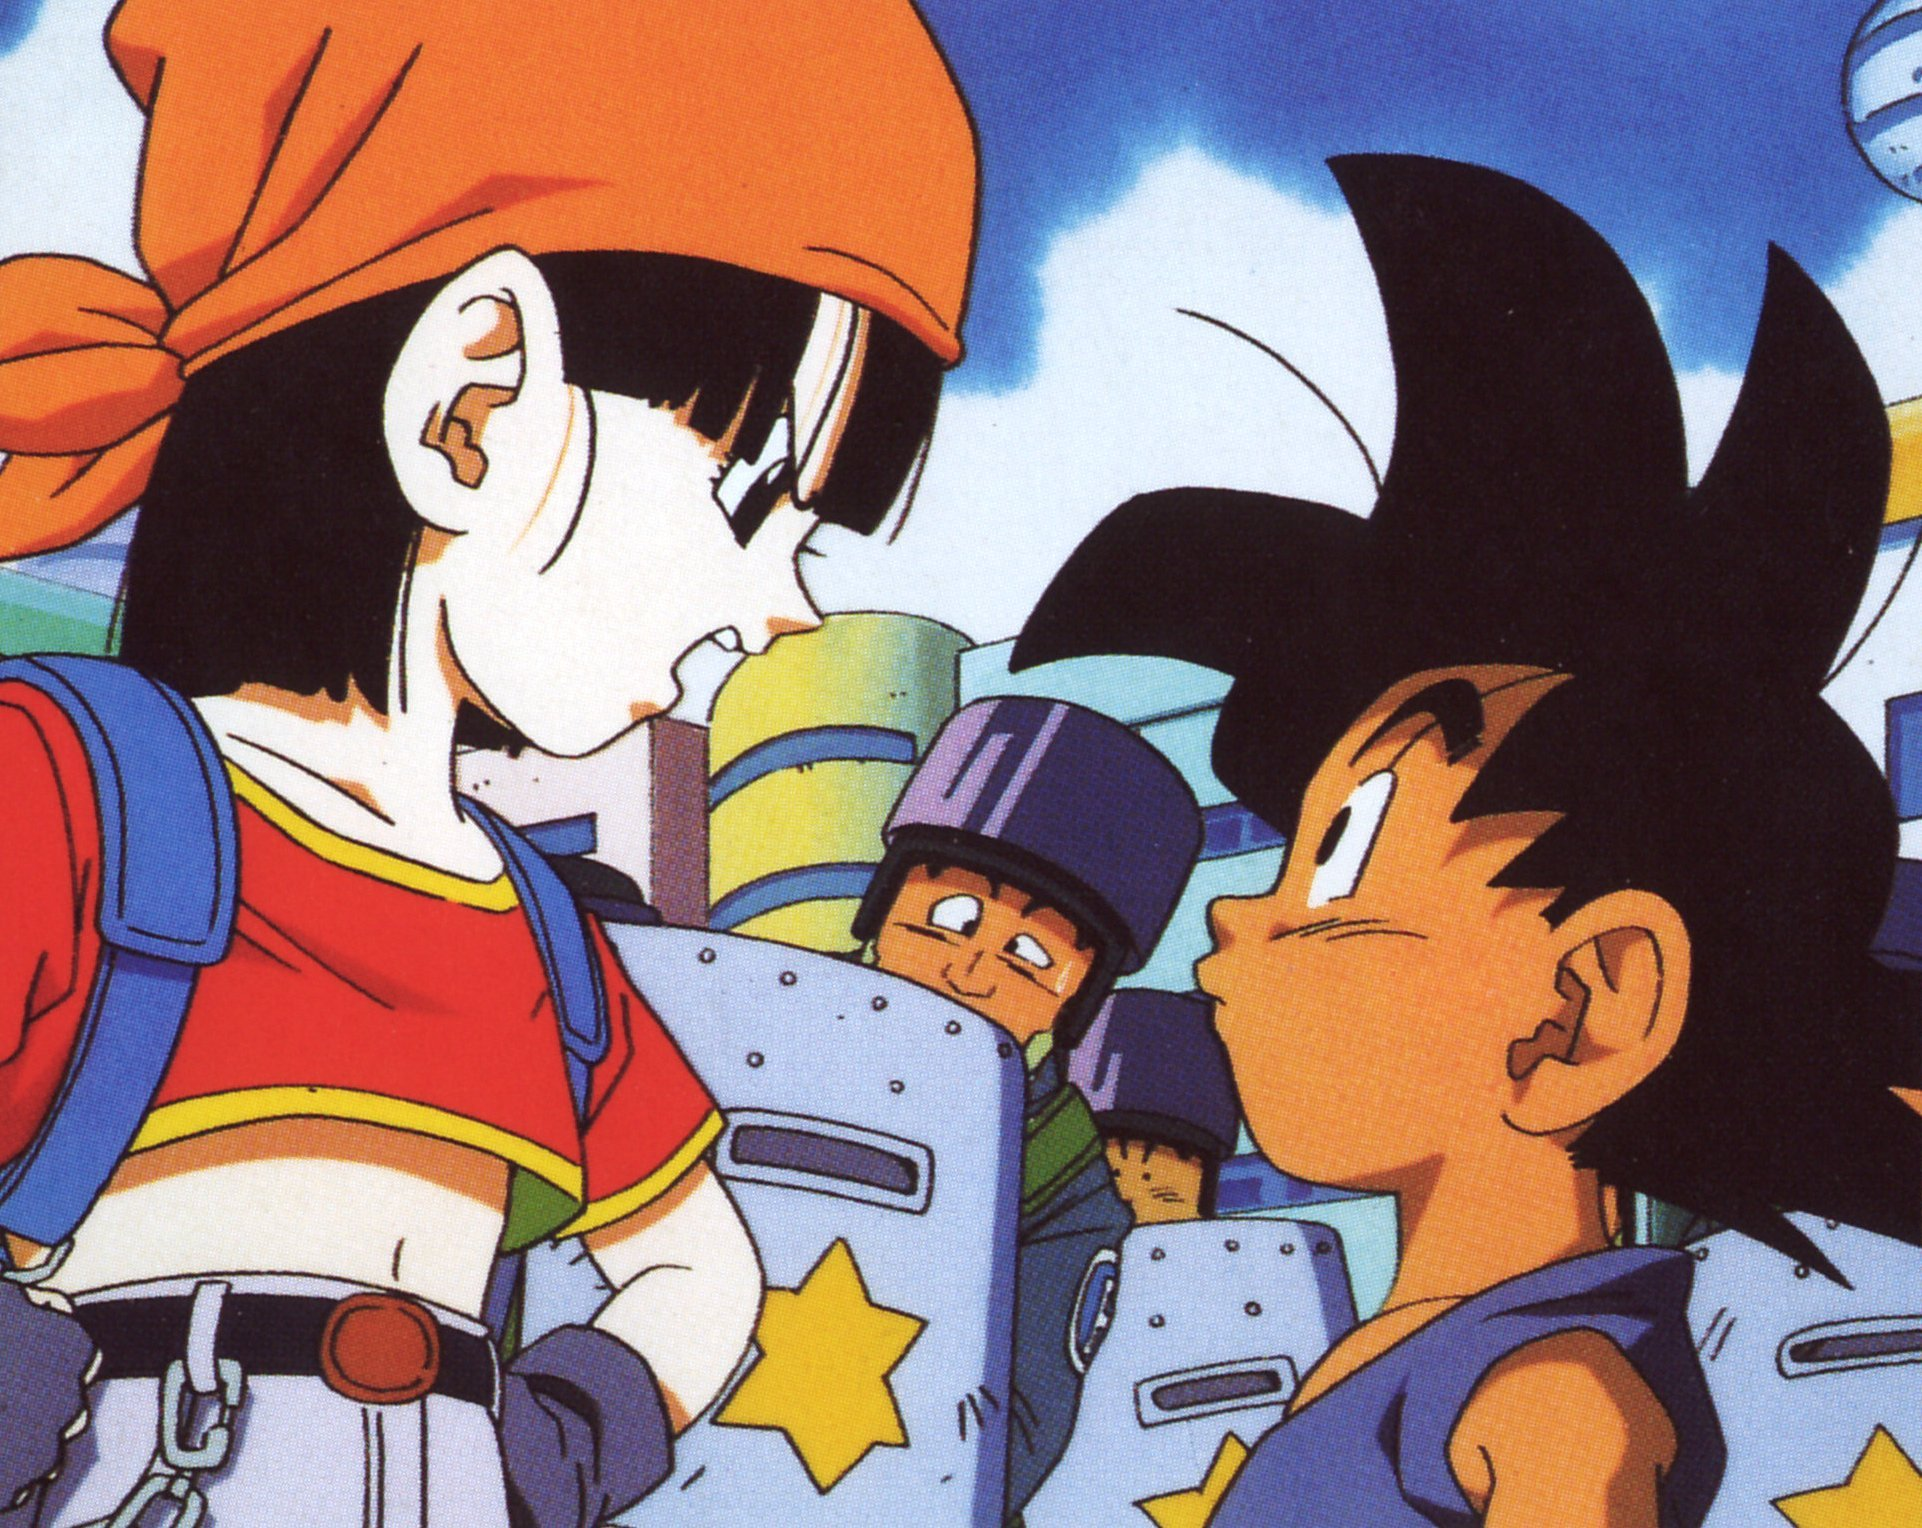 Pan (DRAGON BALL) Image #2998487 - Zerochan Anime Image Board